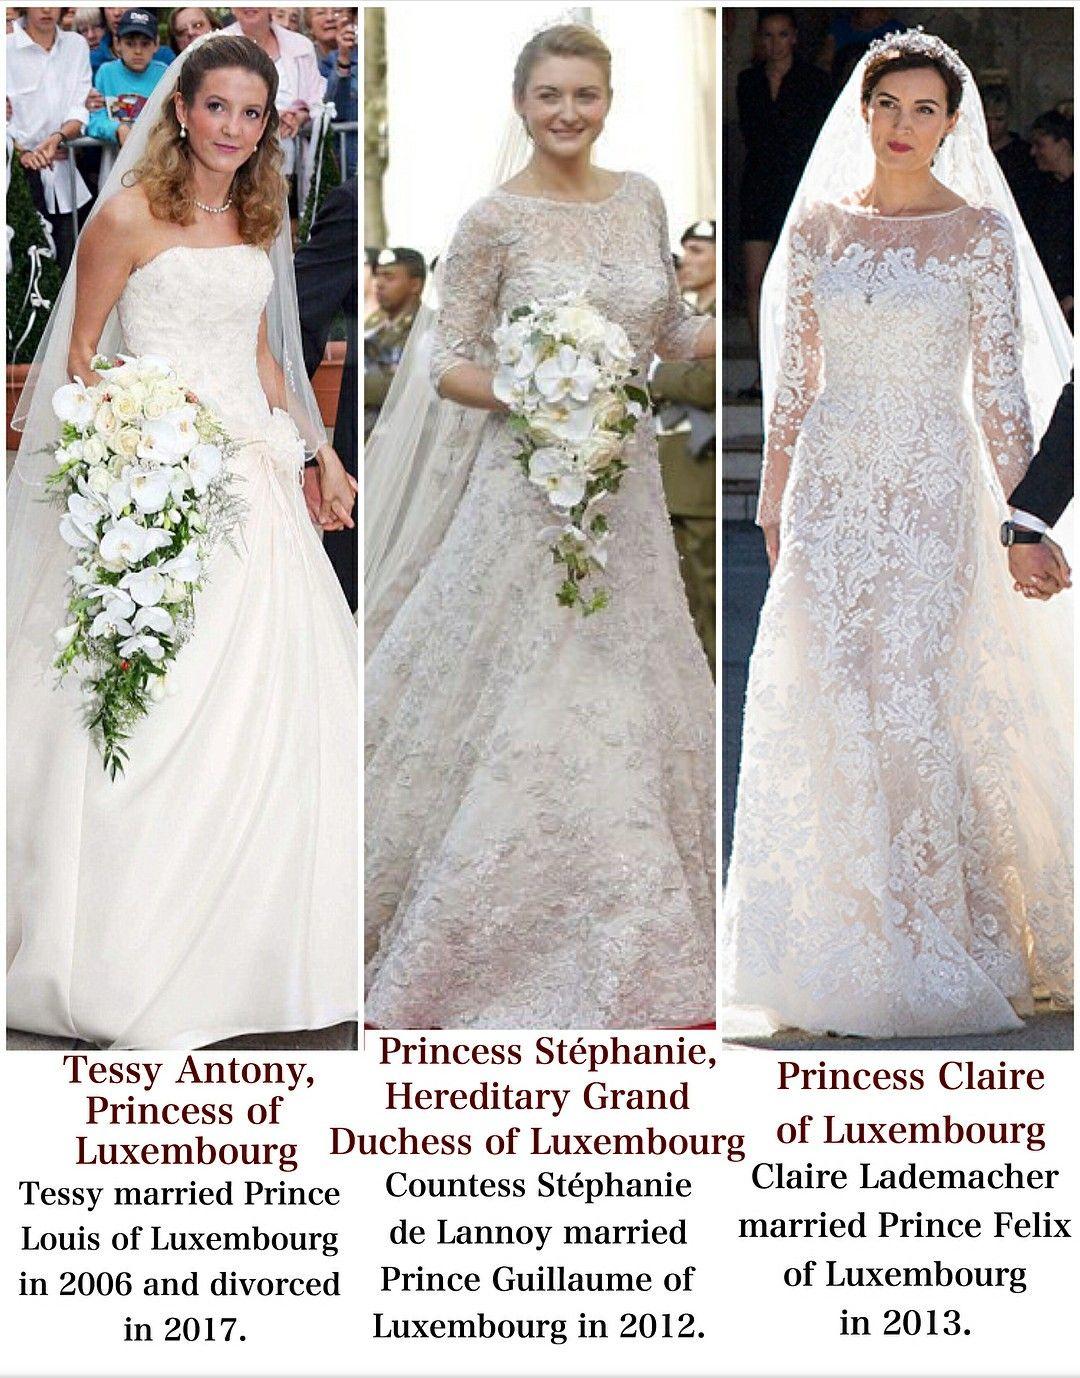 Pin By Catherine Renauld On Royal Brides Royal Brides Royal Weddings Wedding Dresses [ jpg ]